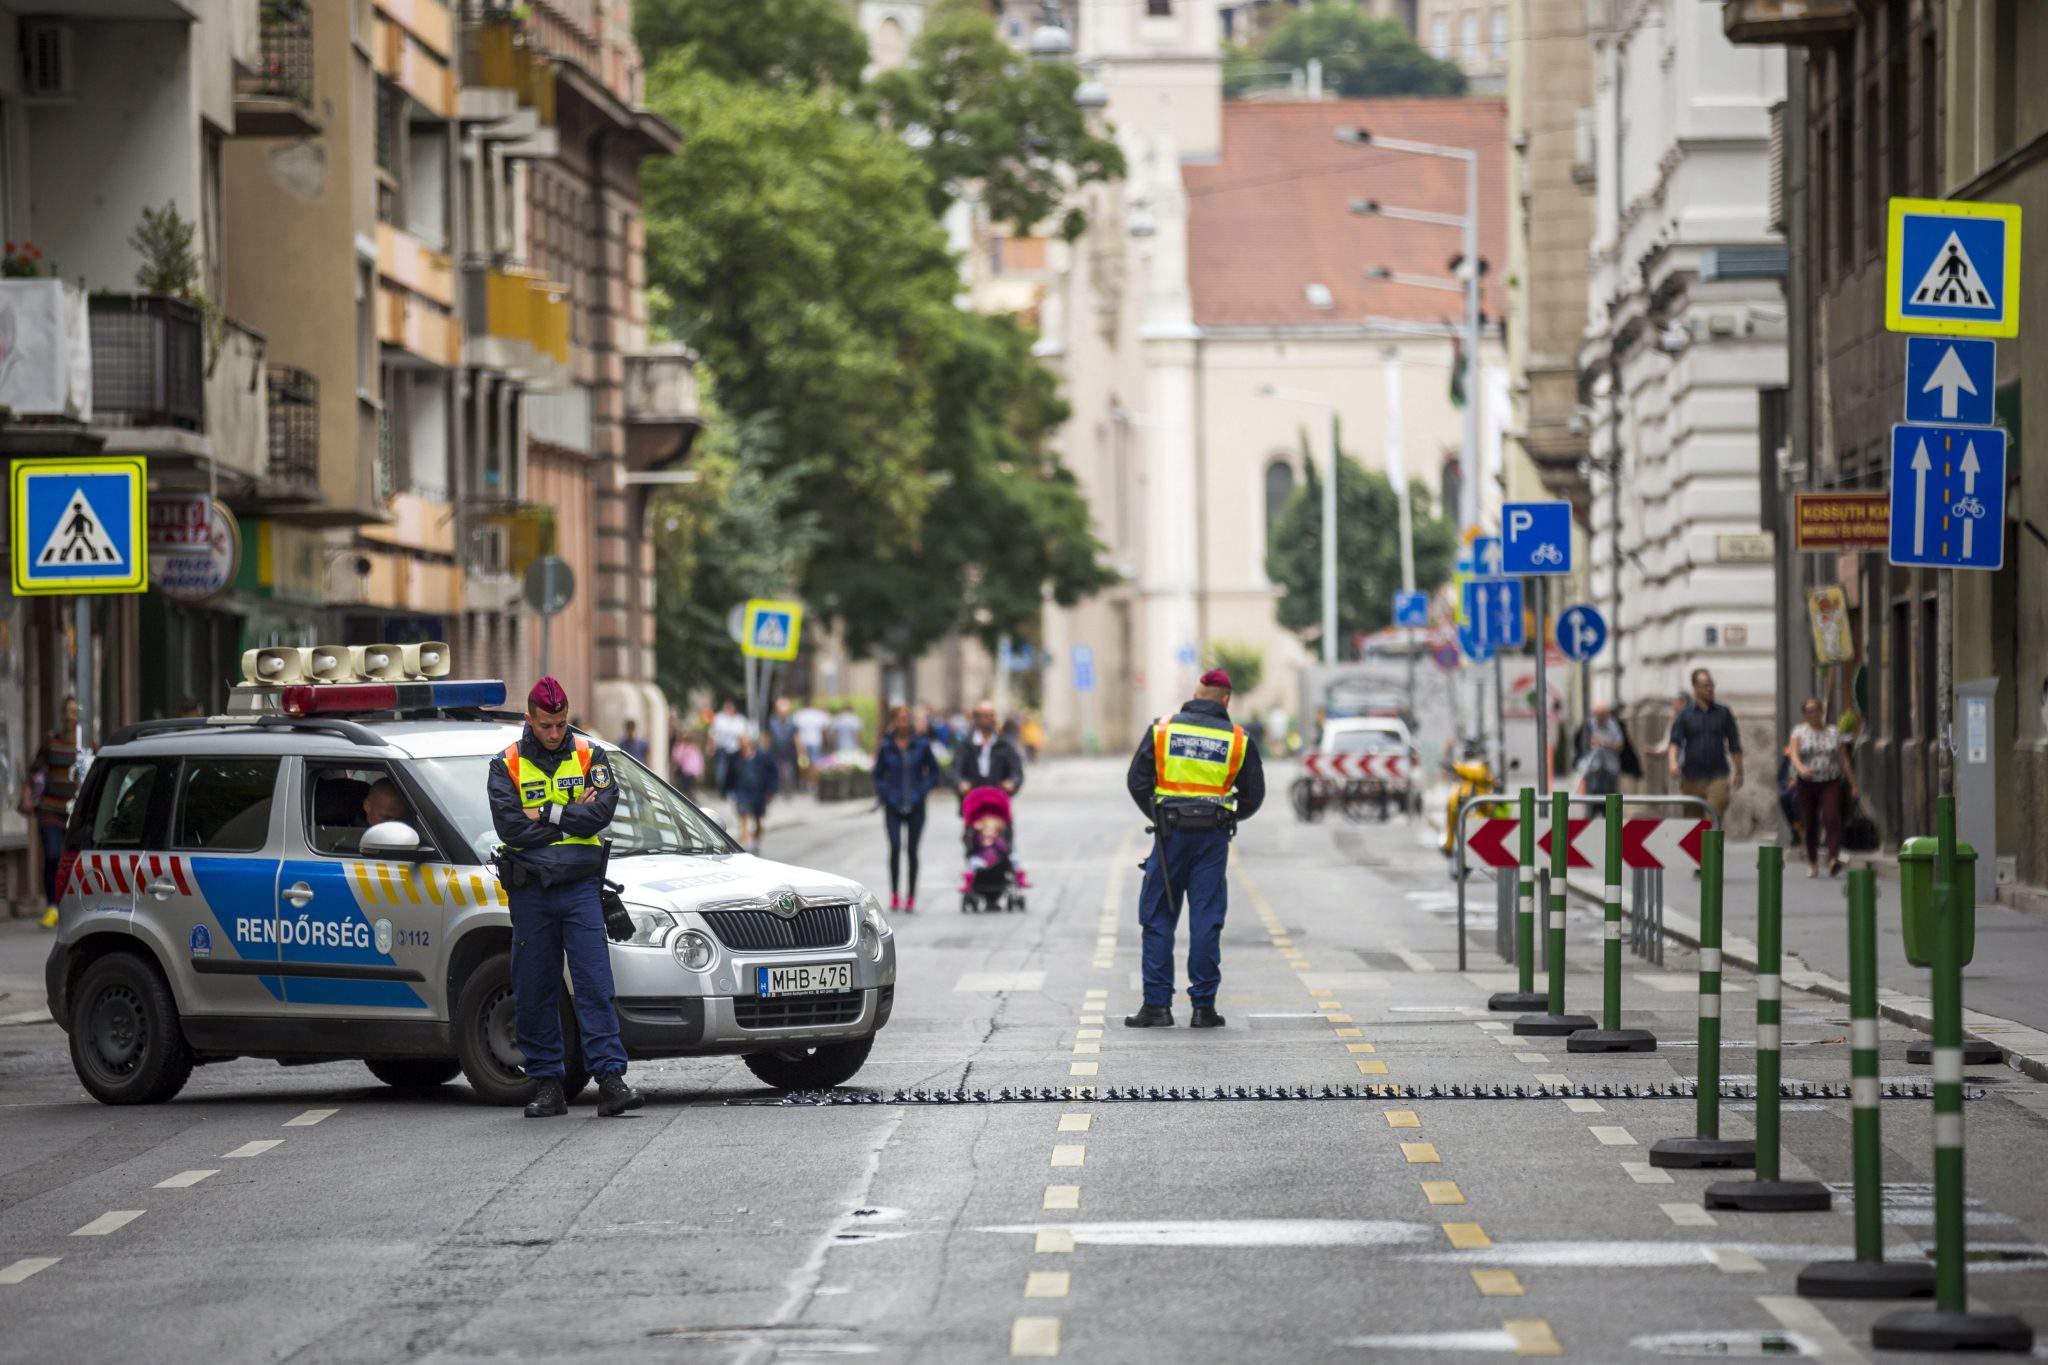 Hungary police